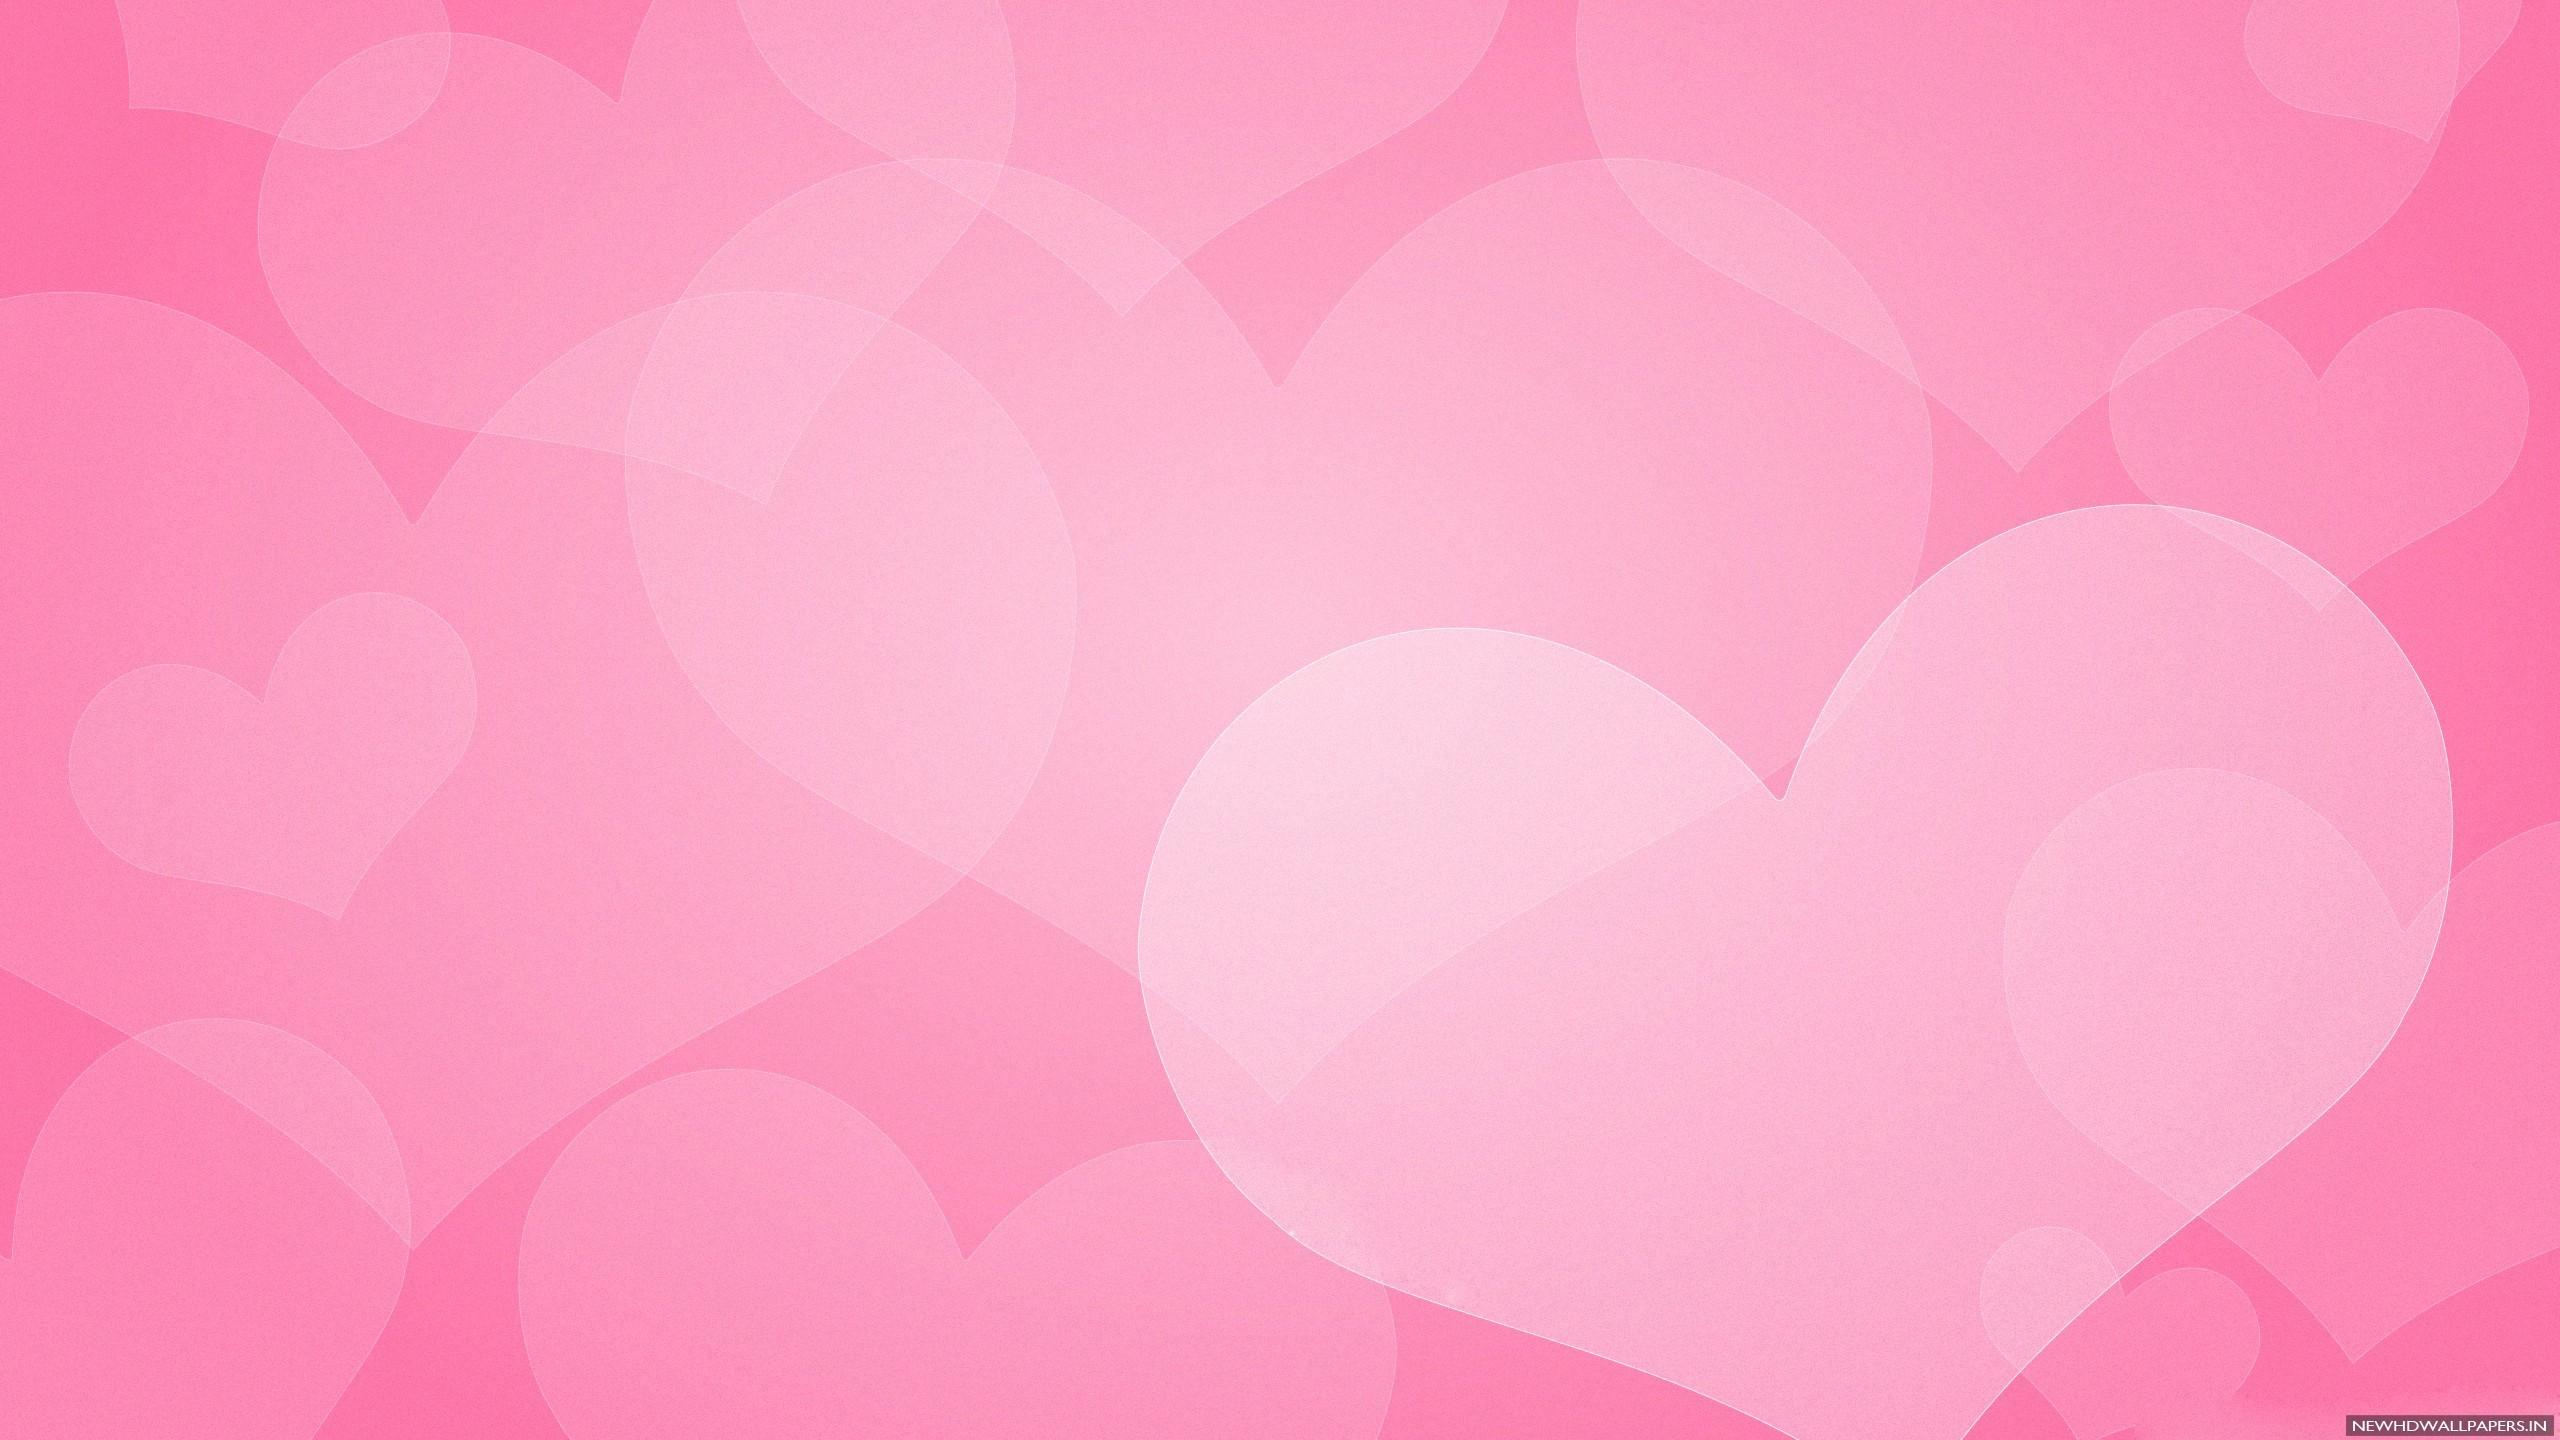 Plain Pink Wallpaper (30 Wallpapers)